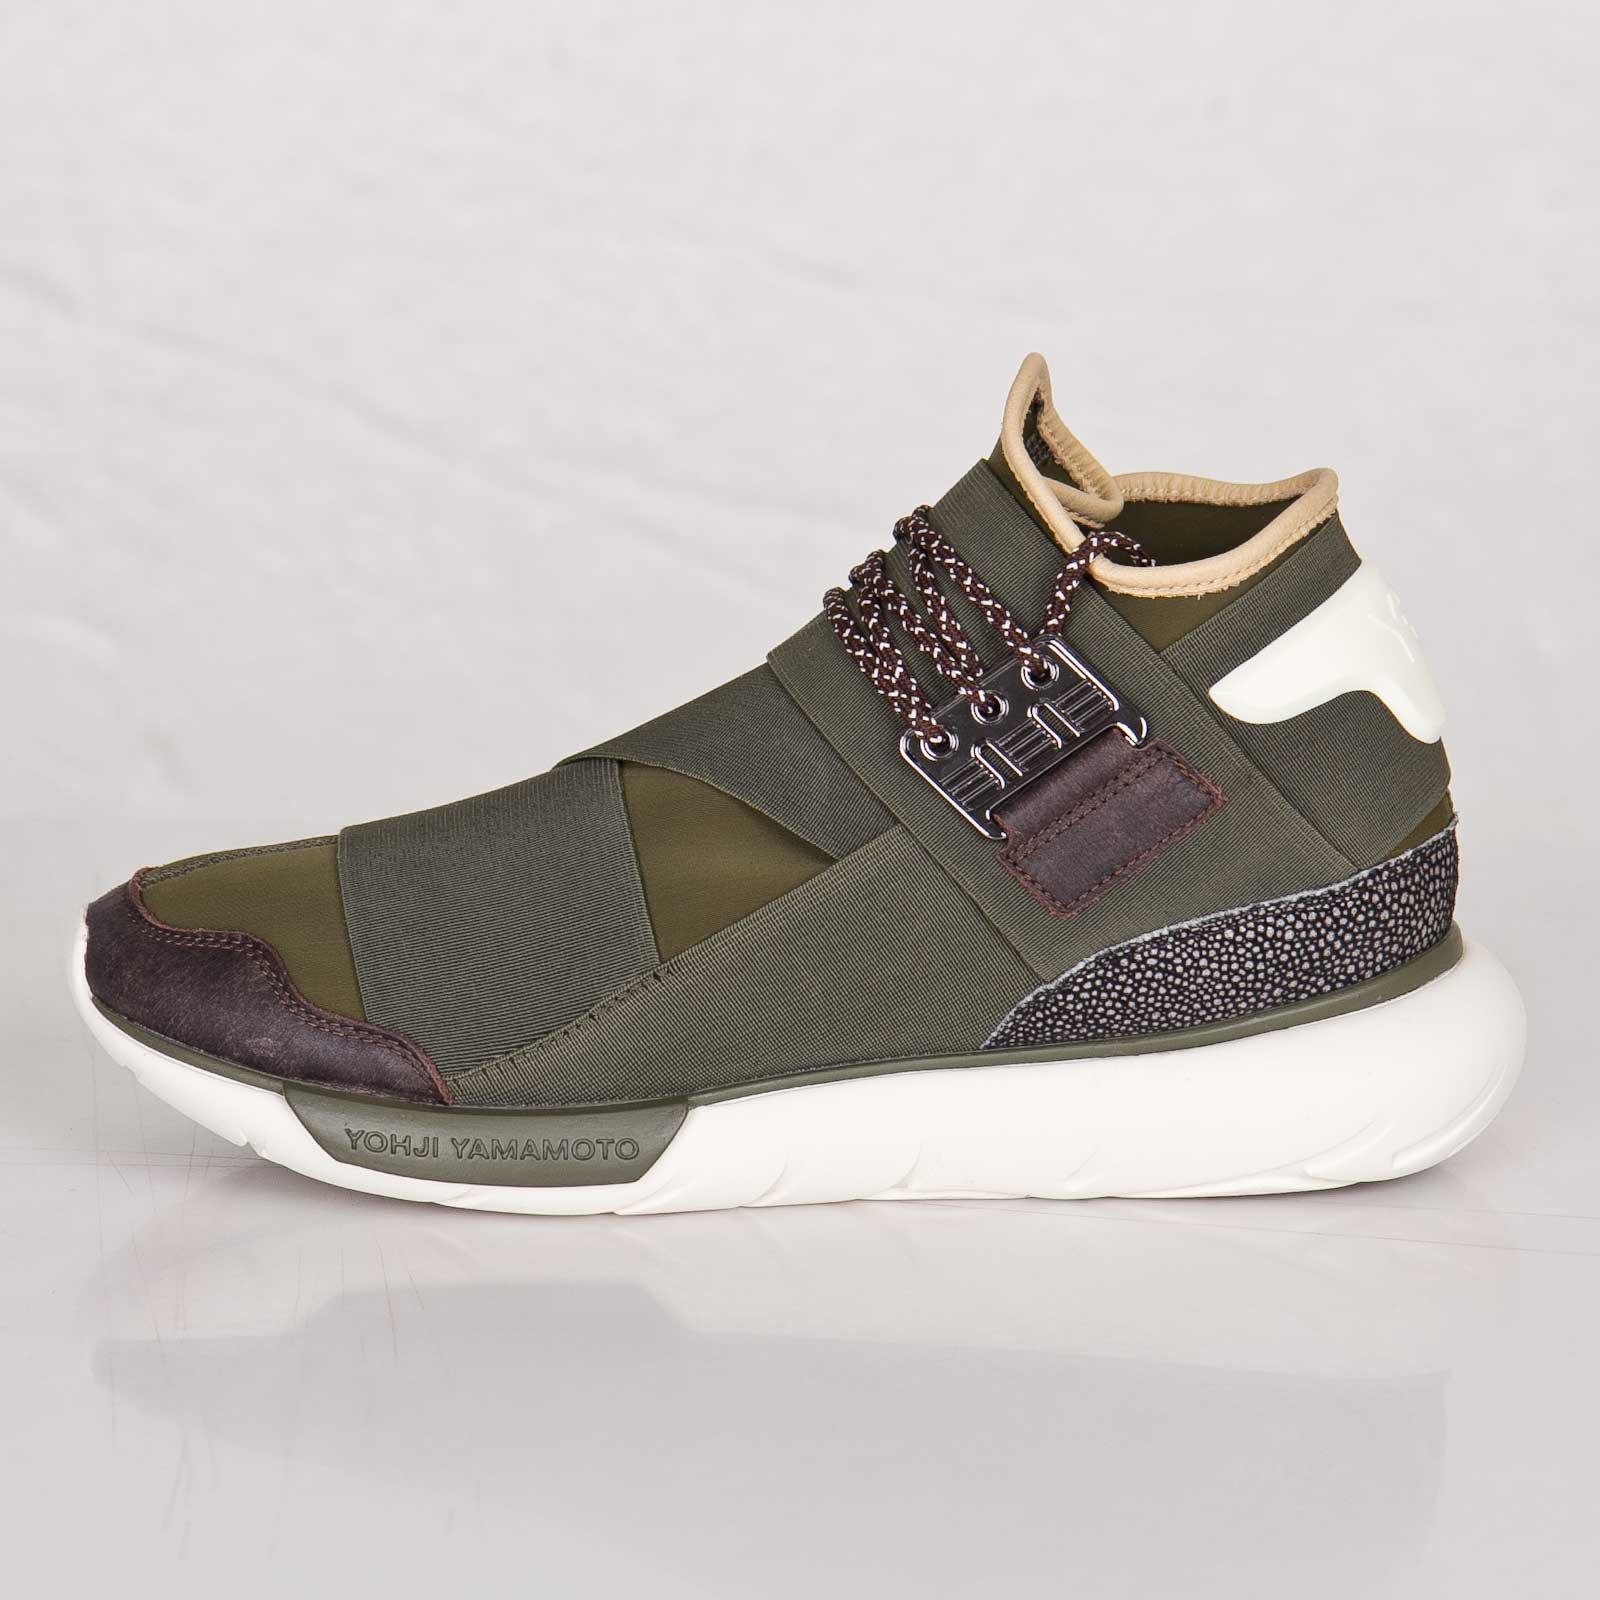 6e21a48e1017 adidas Y-3 Qasa High - M21249 - Sneakersnstuff